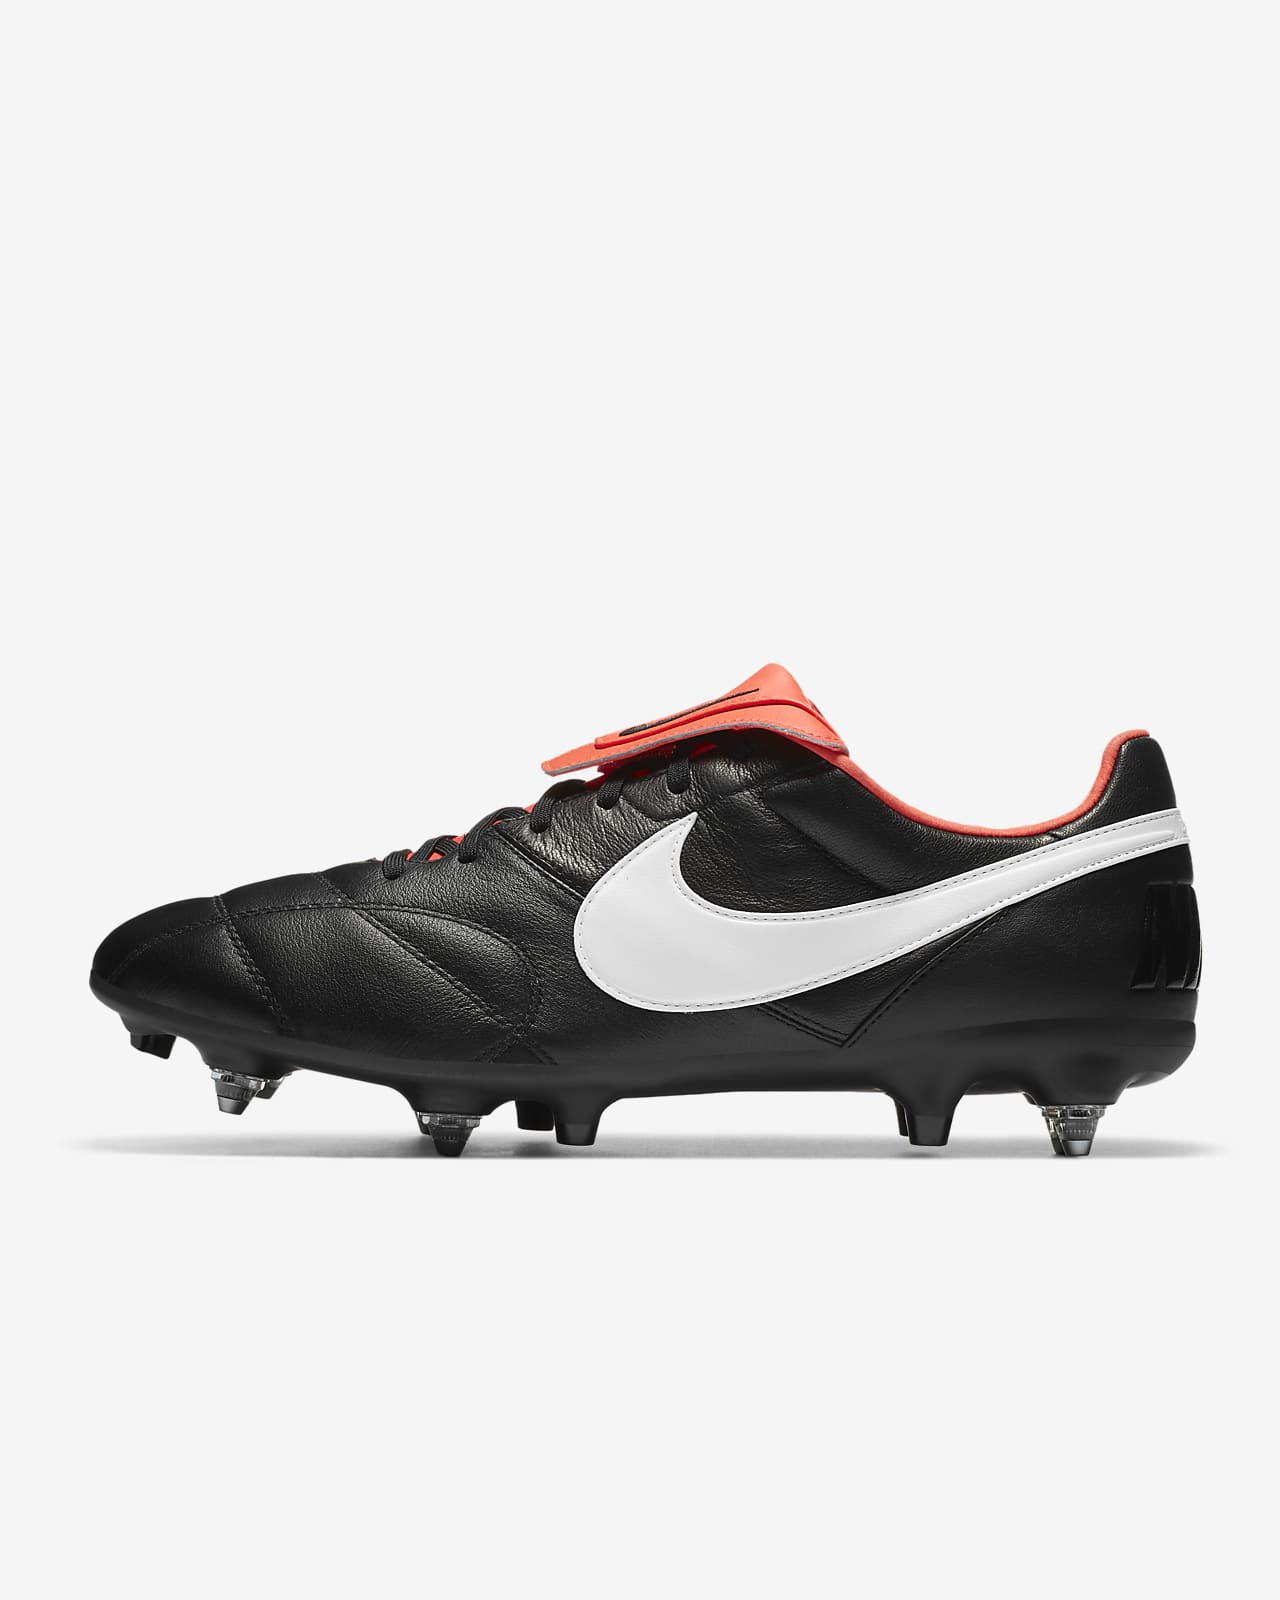 Nike Premier 2 SG-Pro AC Botes de futbol per a terreny tou